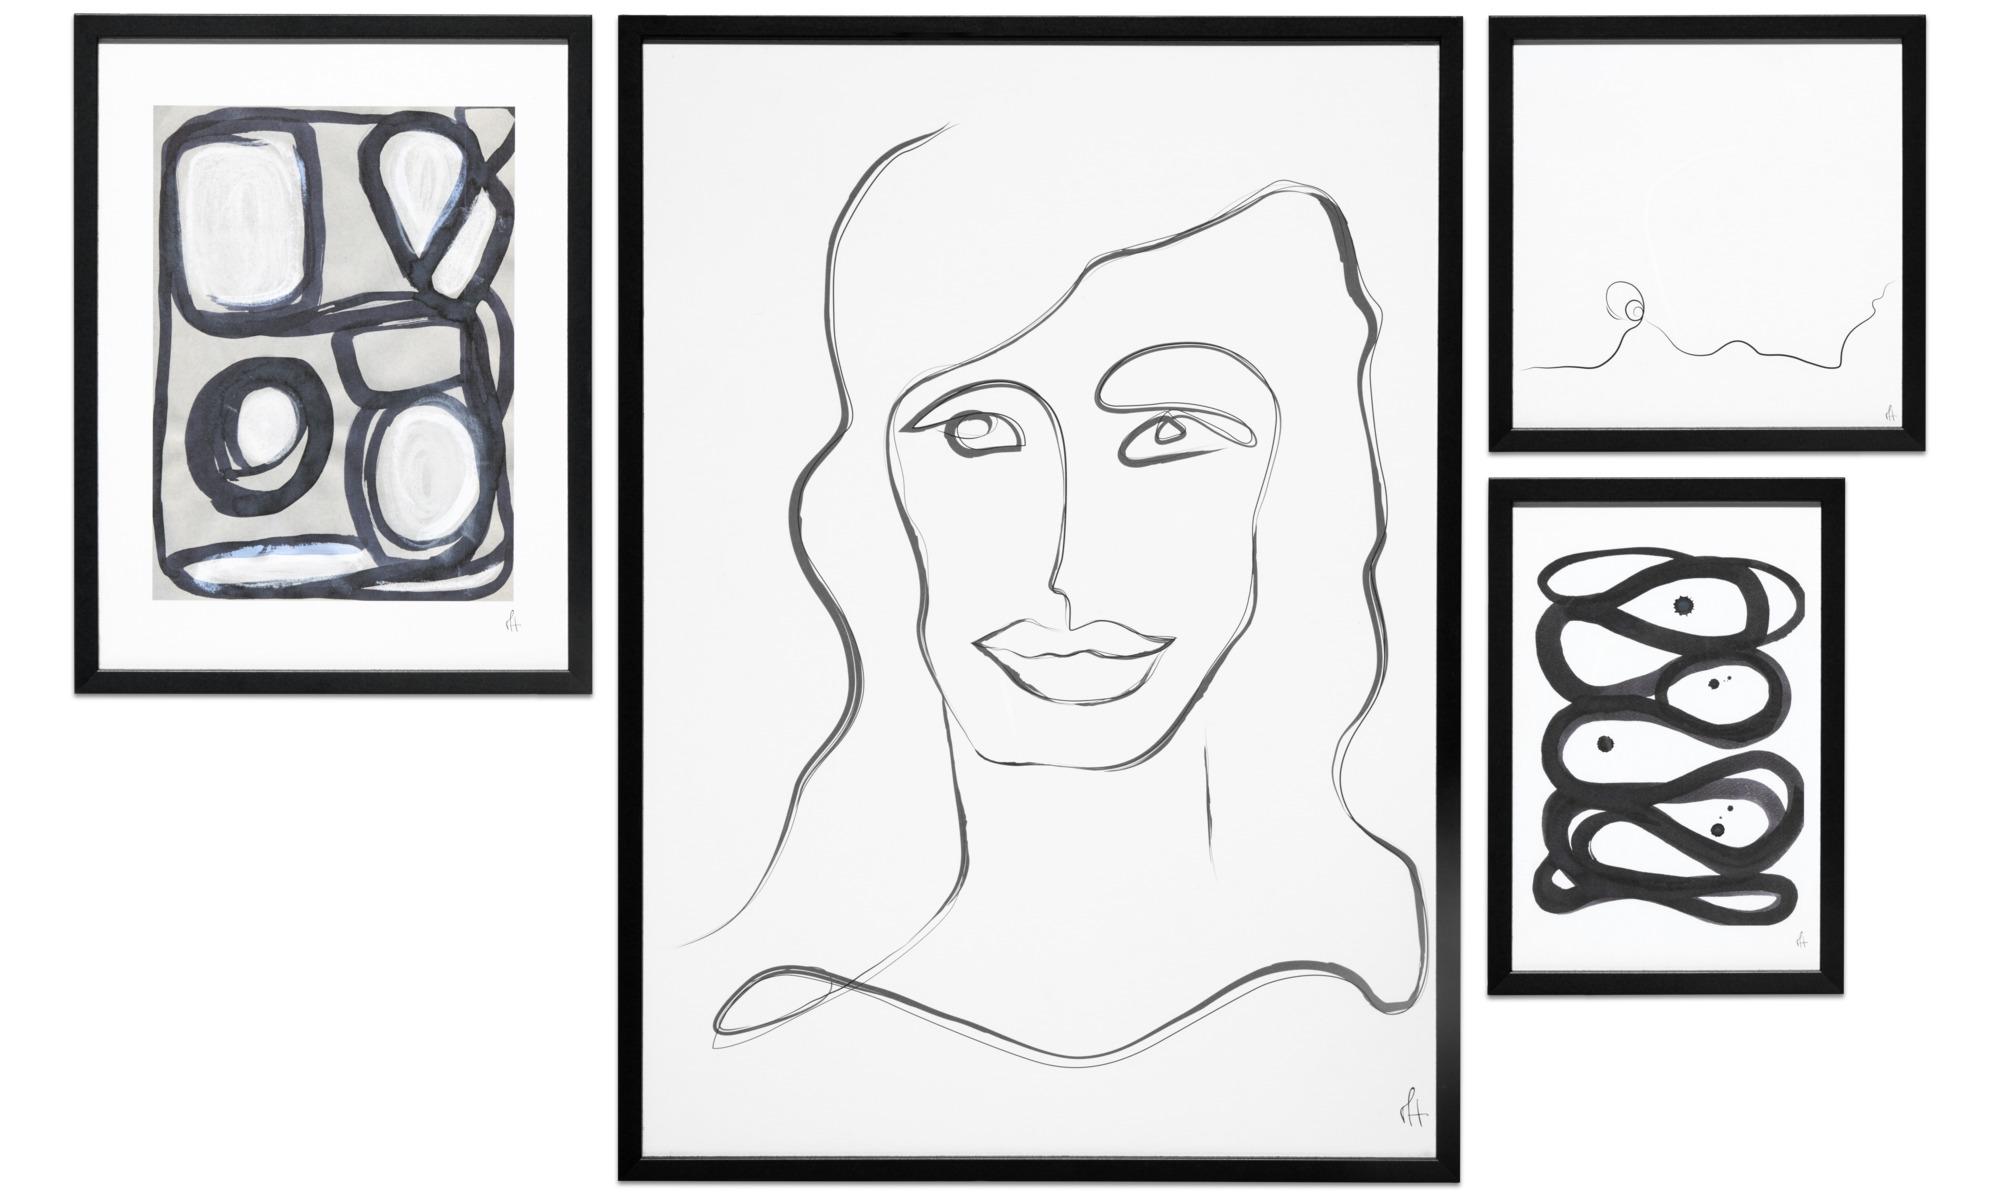 Gallery - Art Lines art on paper, set of 4 pcs. - Black - Paper